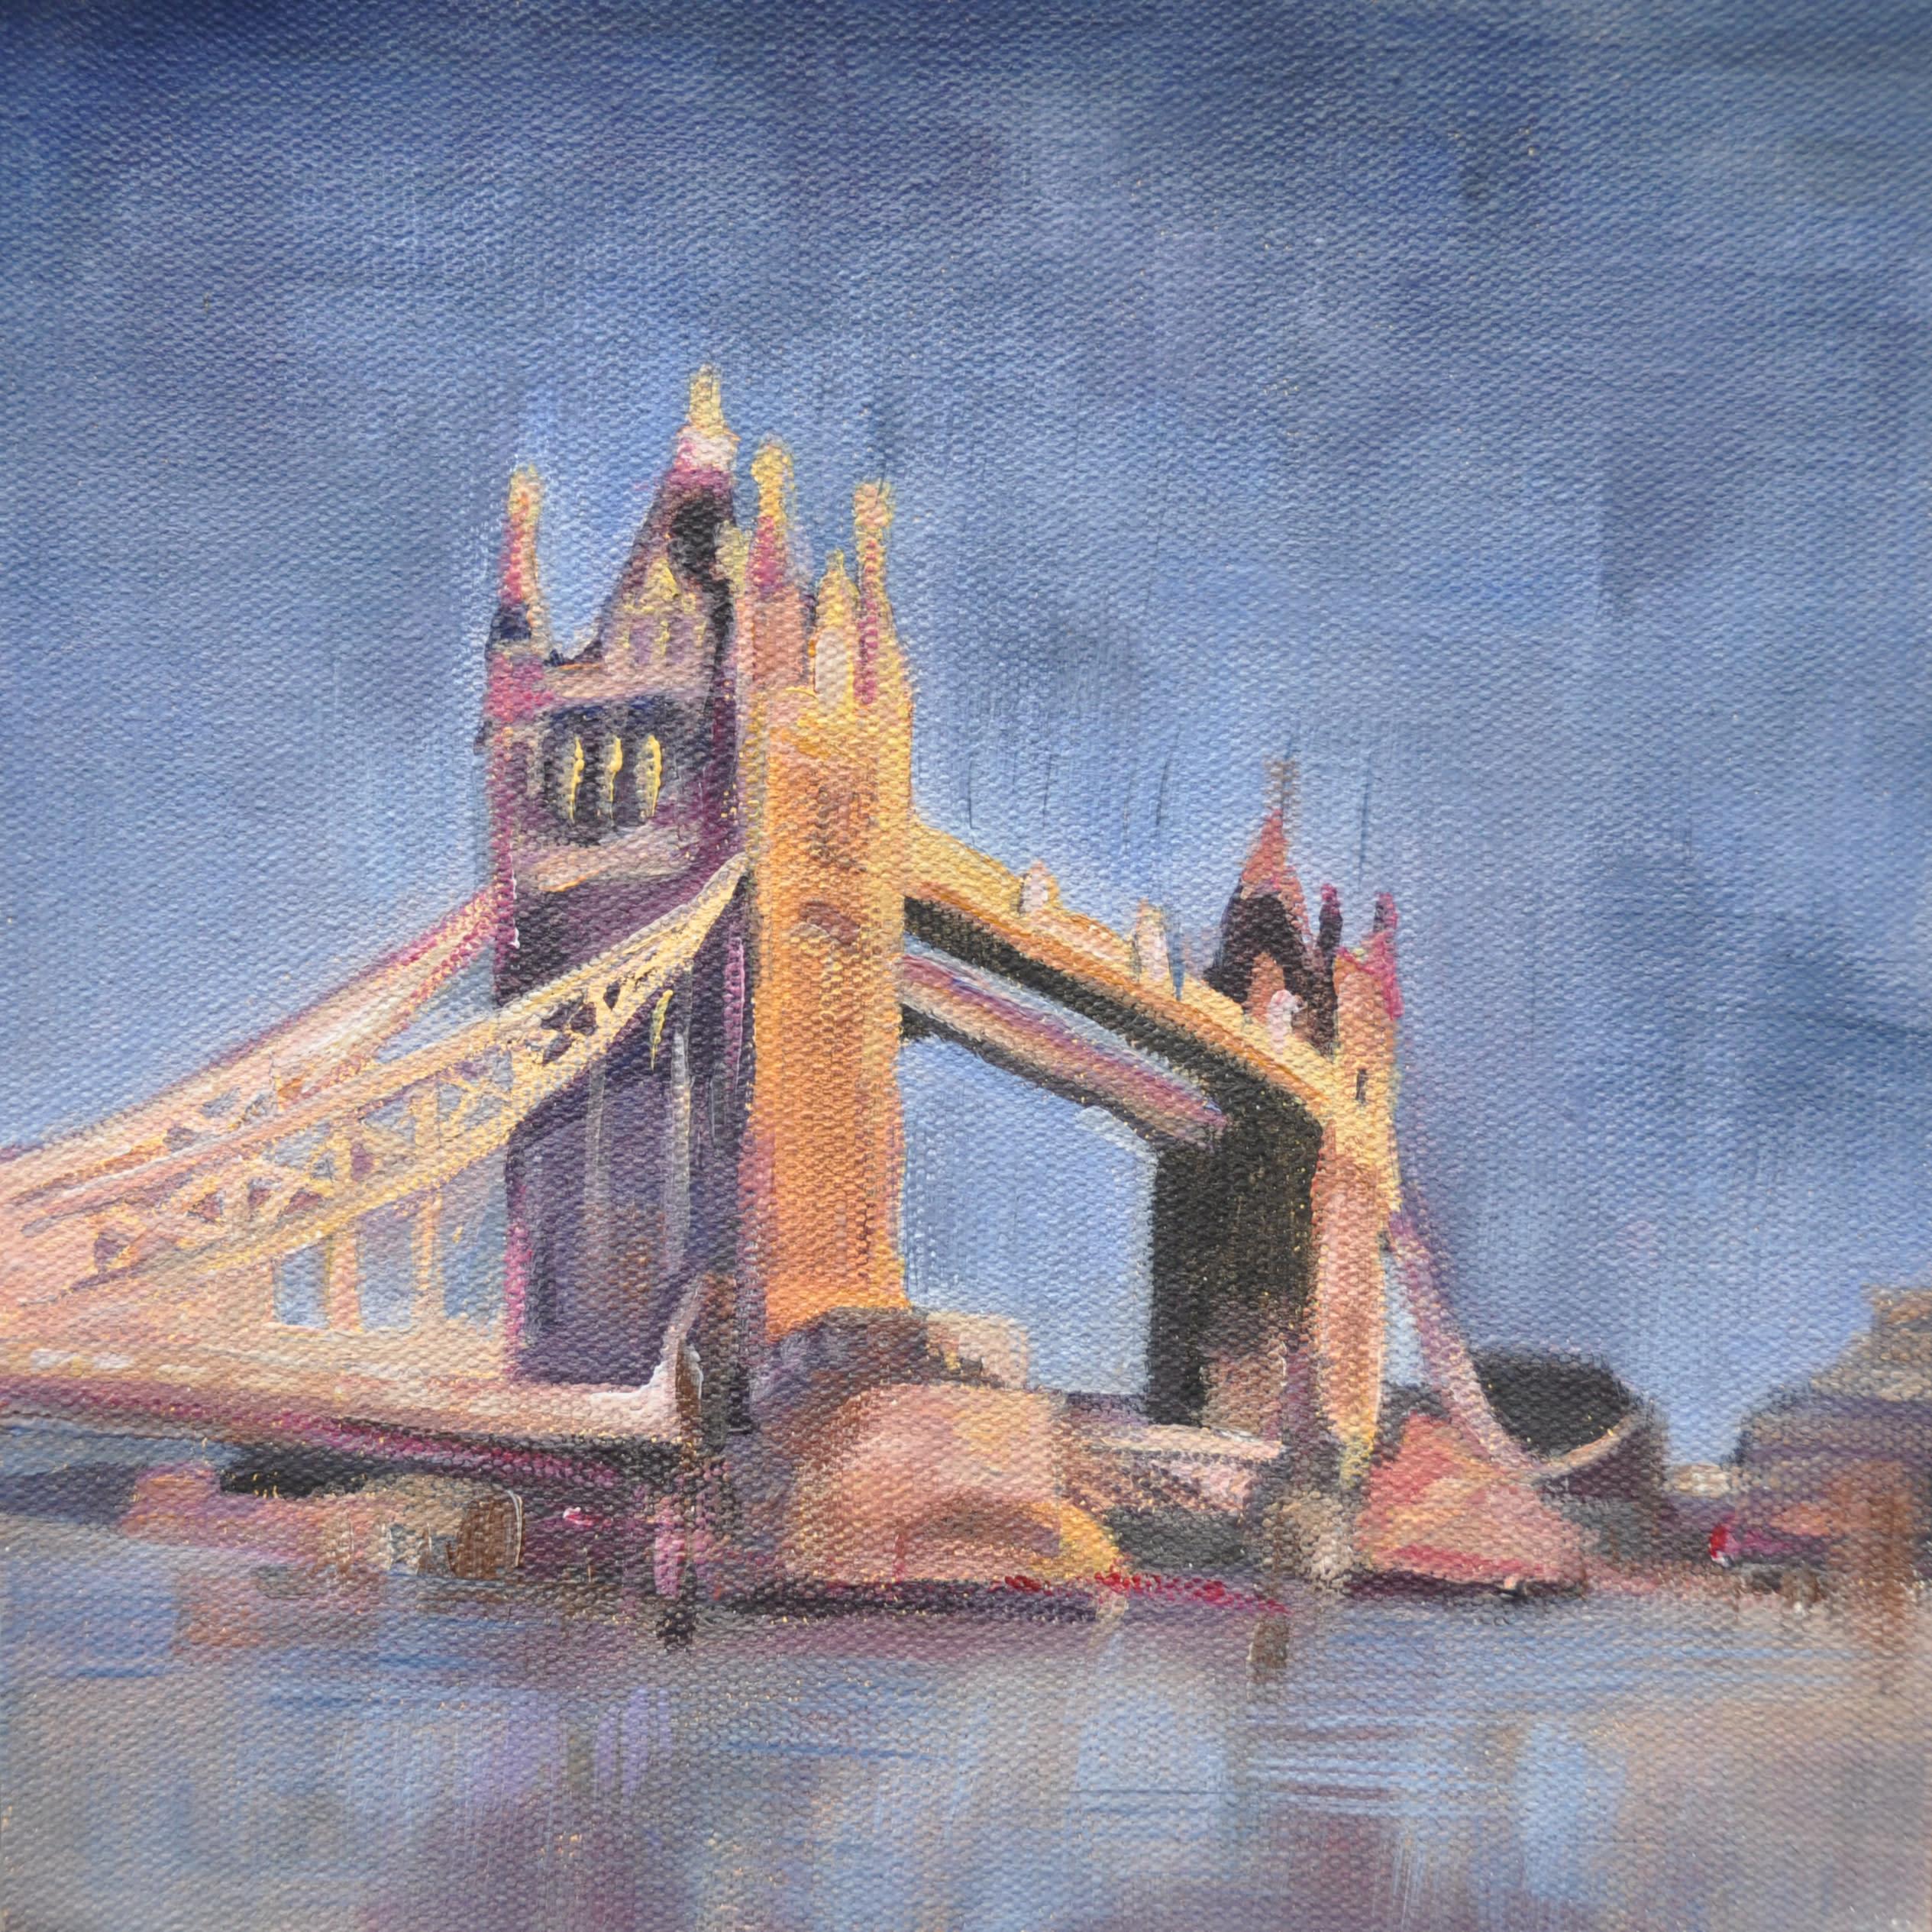 19x19 london tower bridge by steph fonteyn pfoava